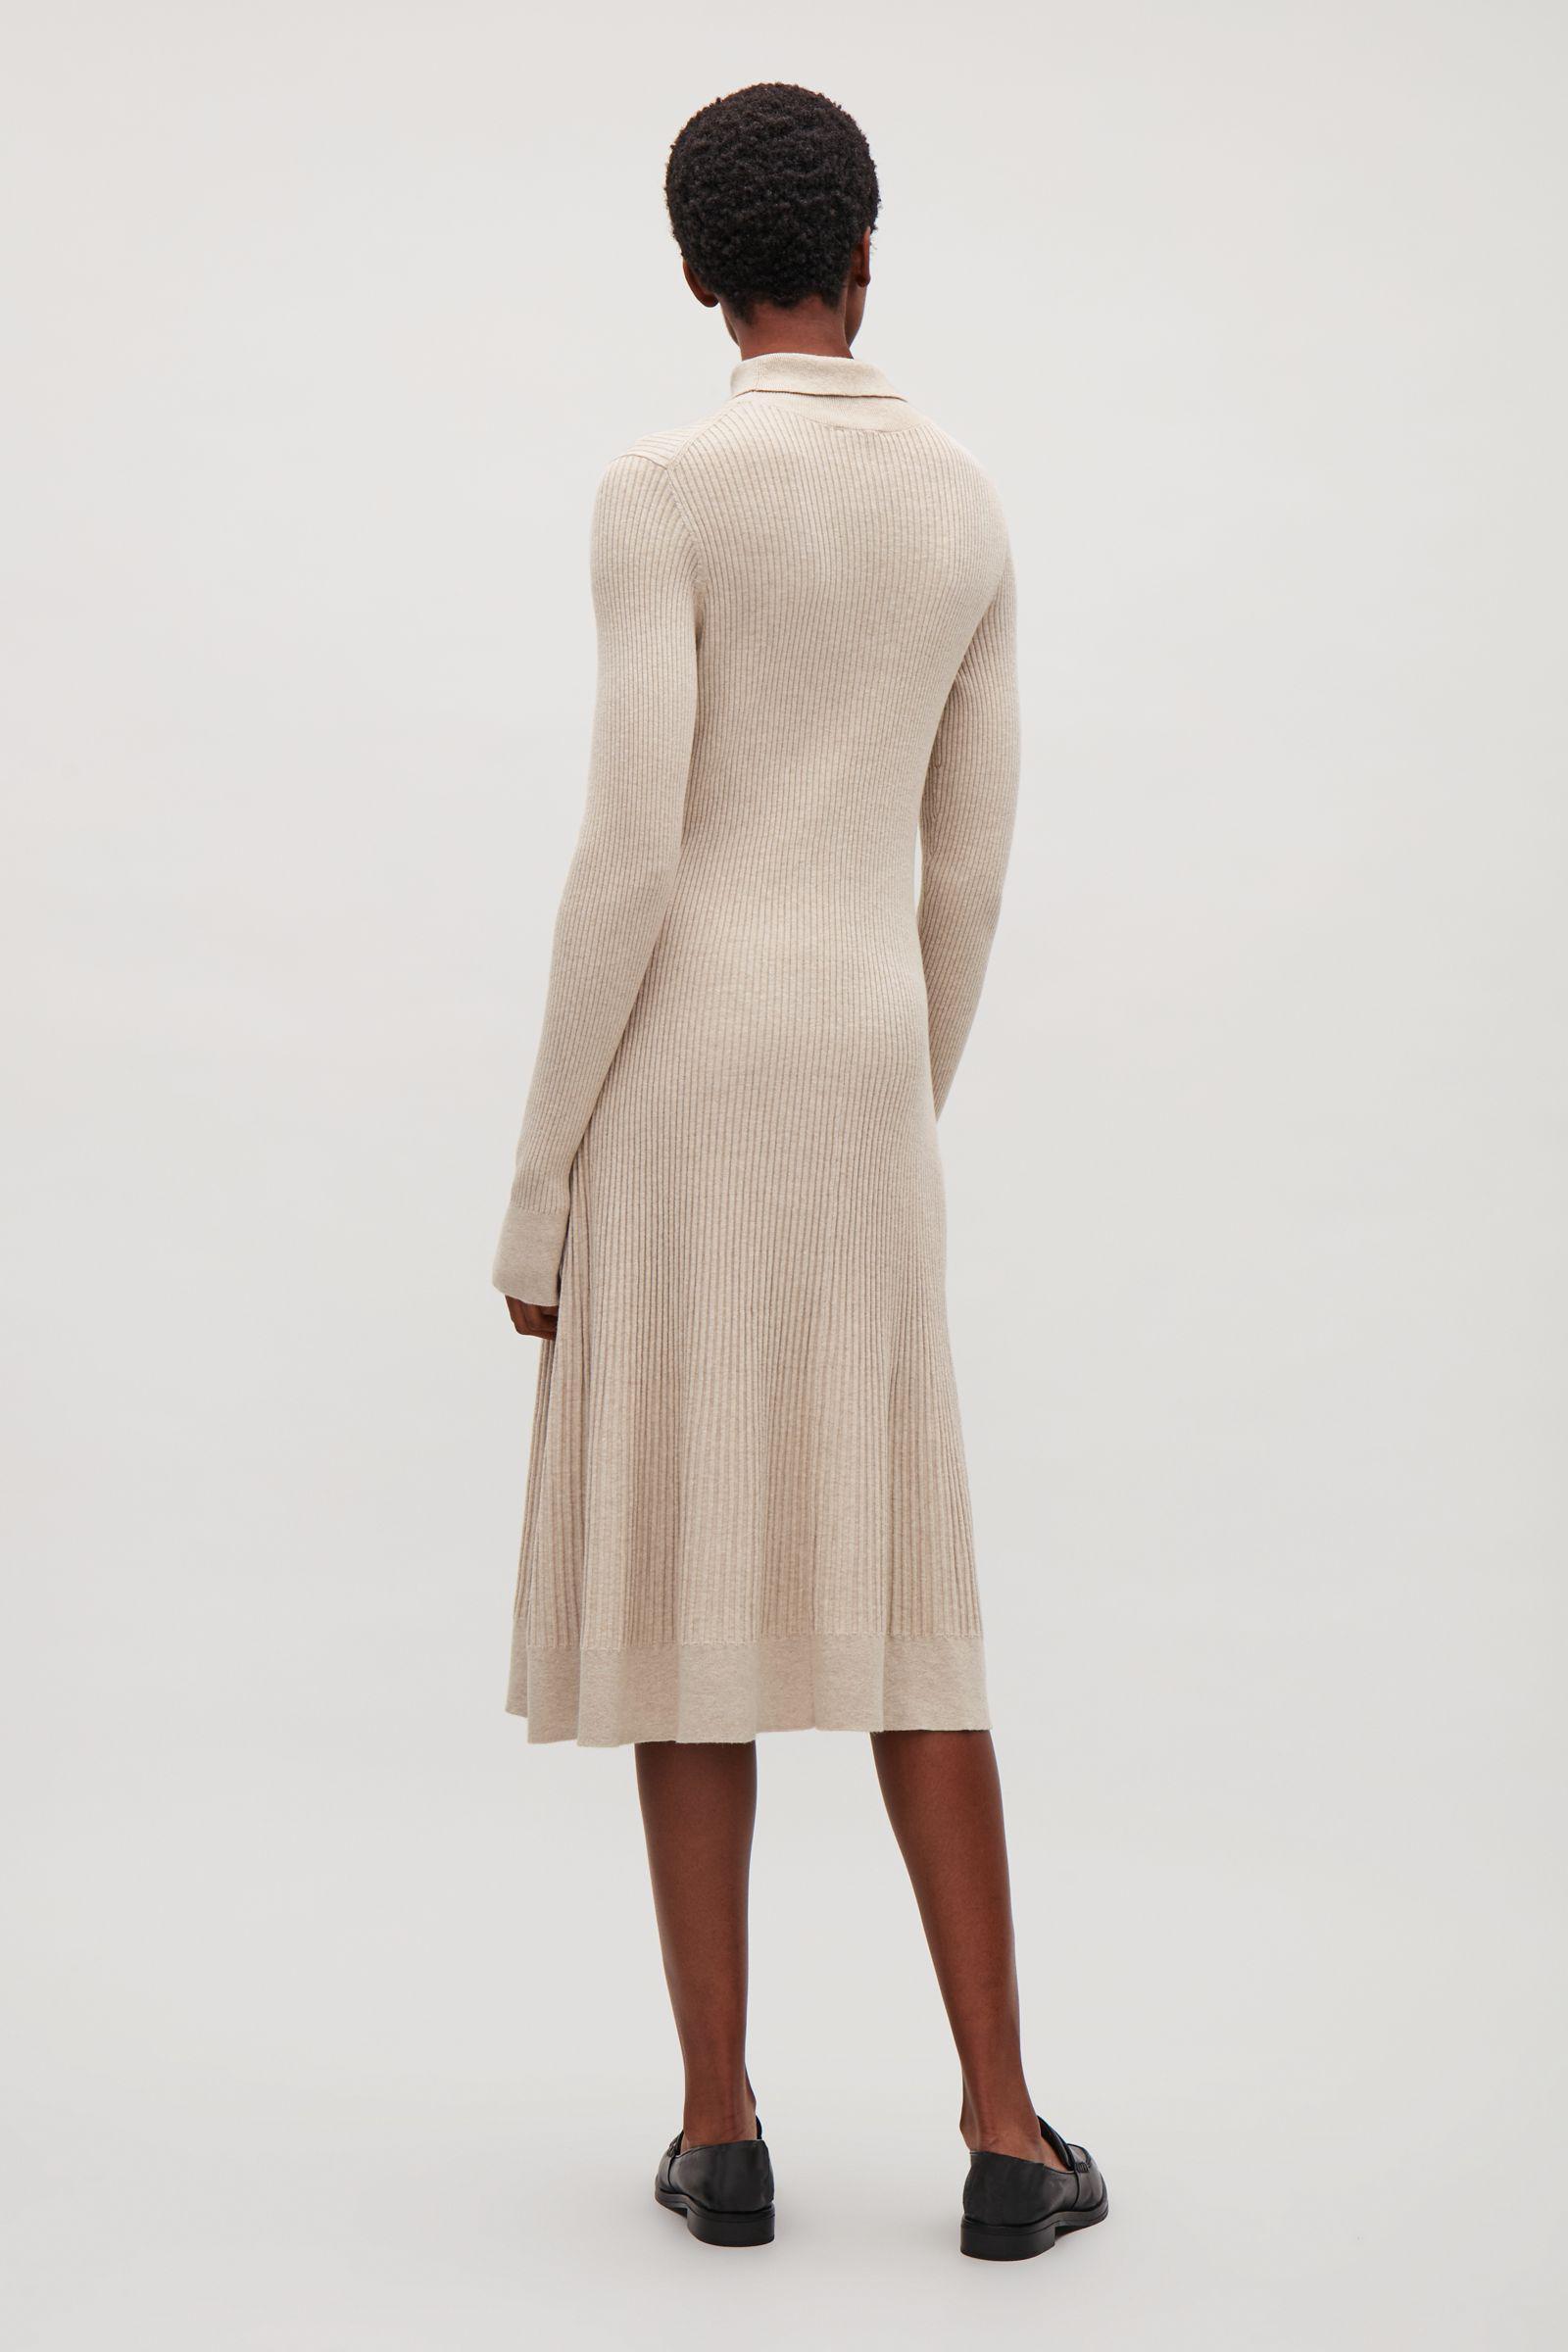 80c7040d3740 COS Rib-knit Dress in Natural - Lyst